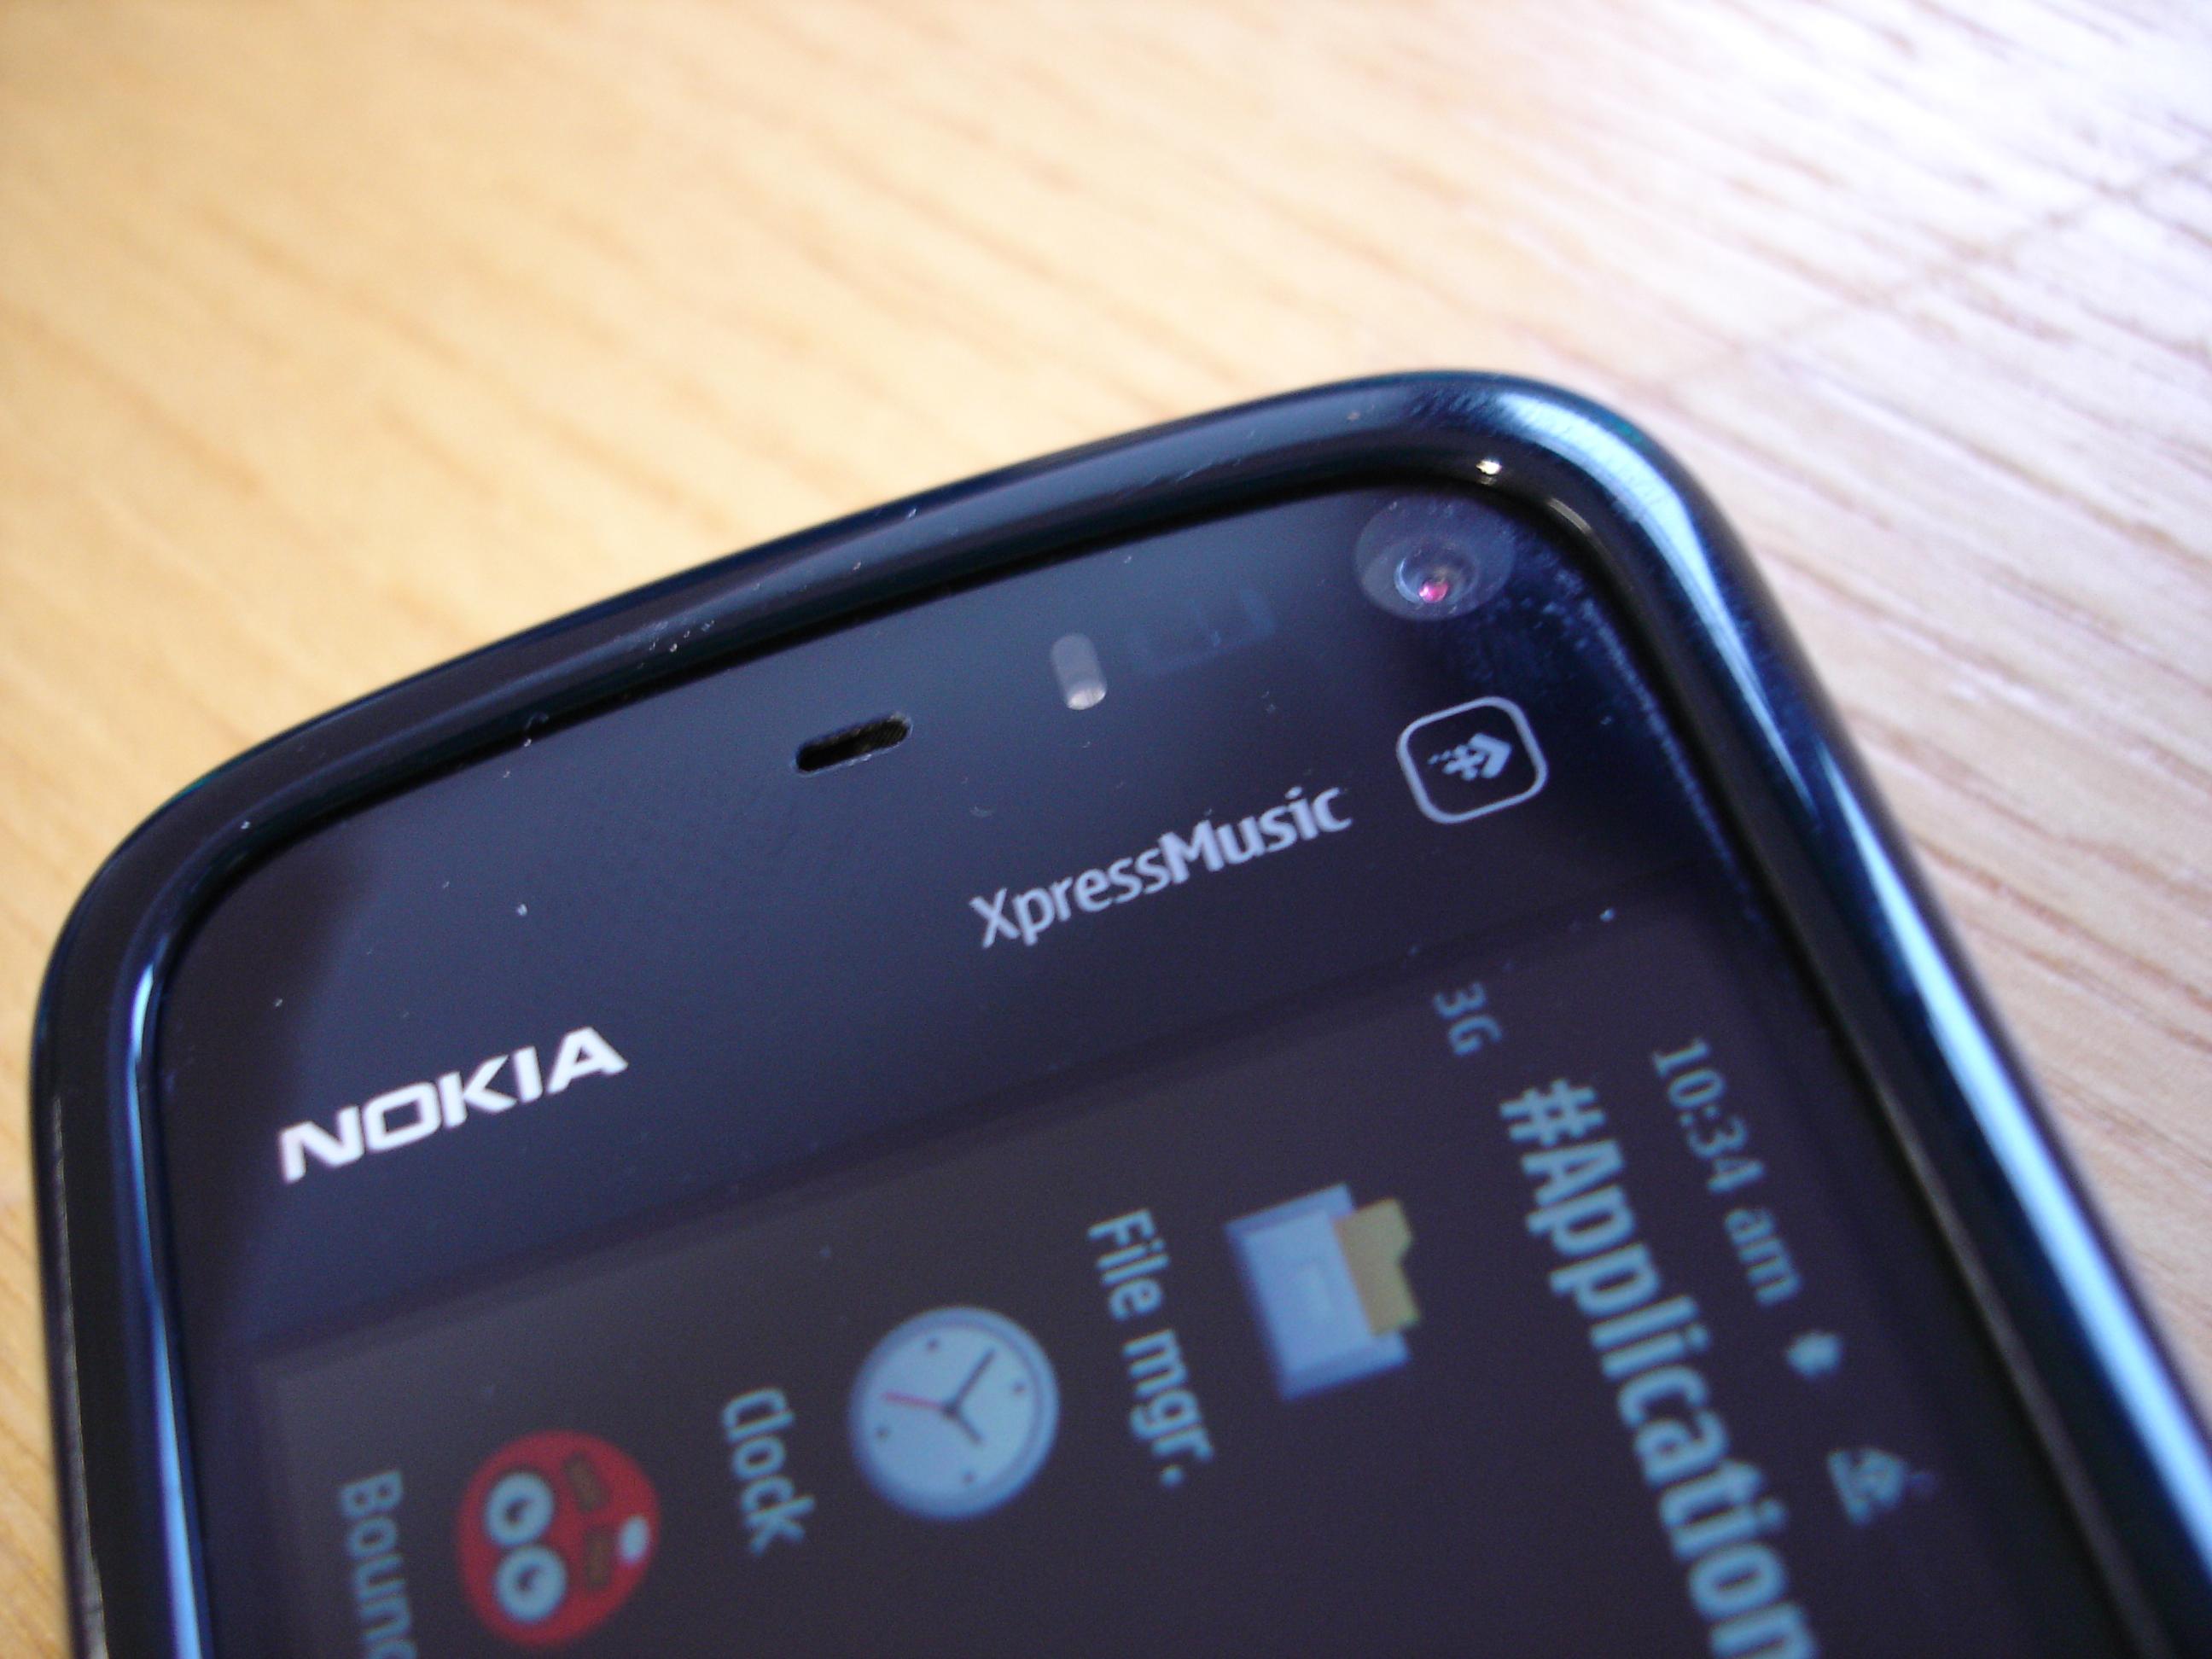 Iphone naughty text symbols